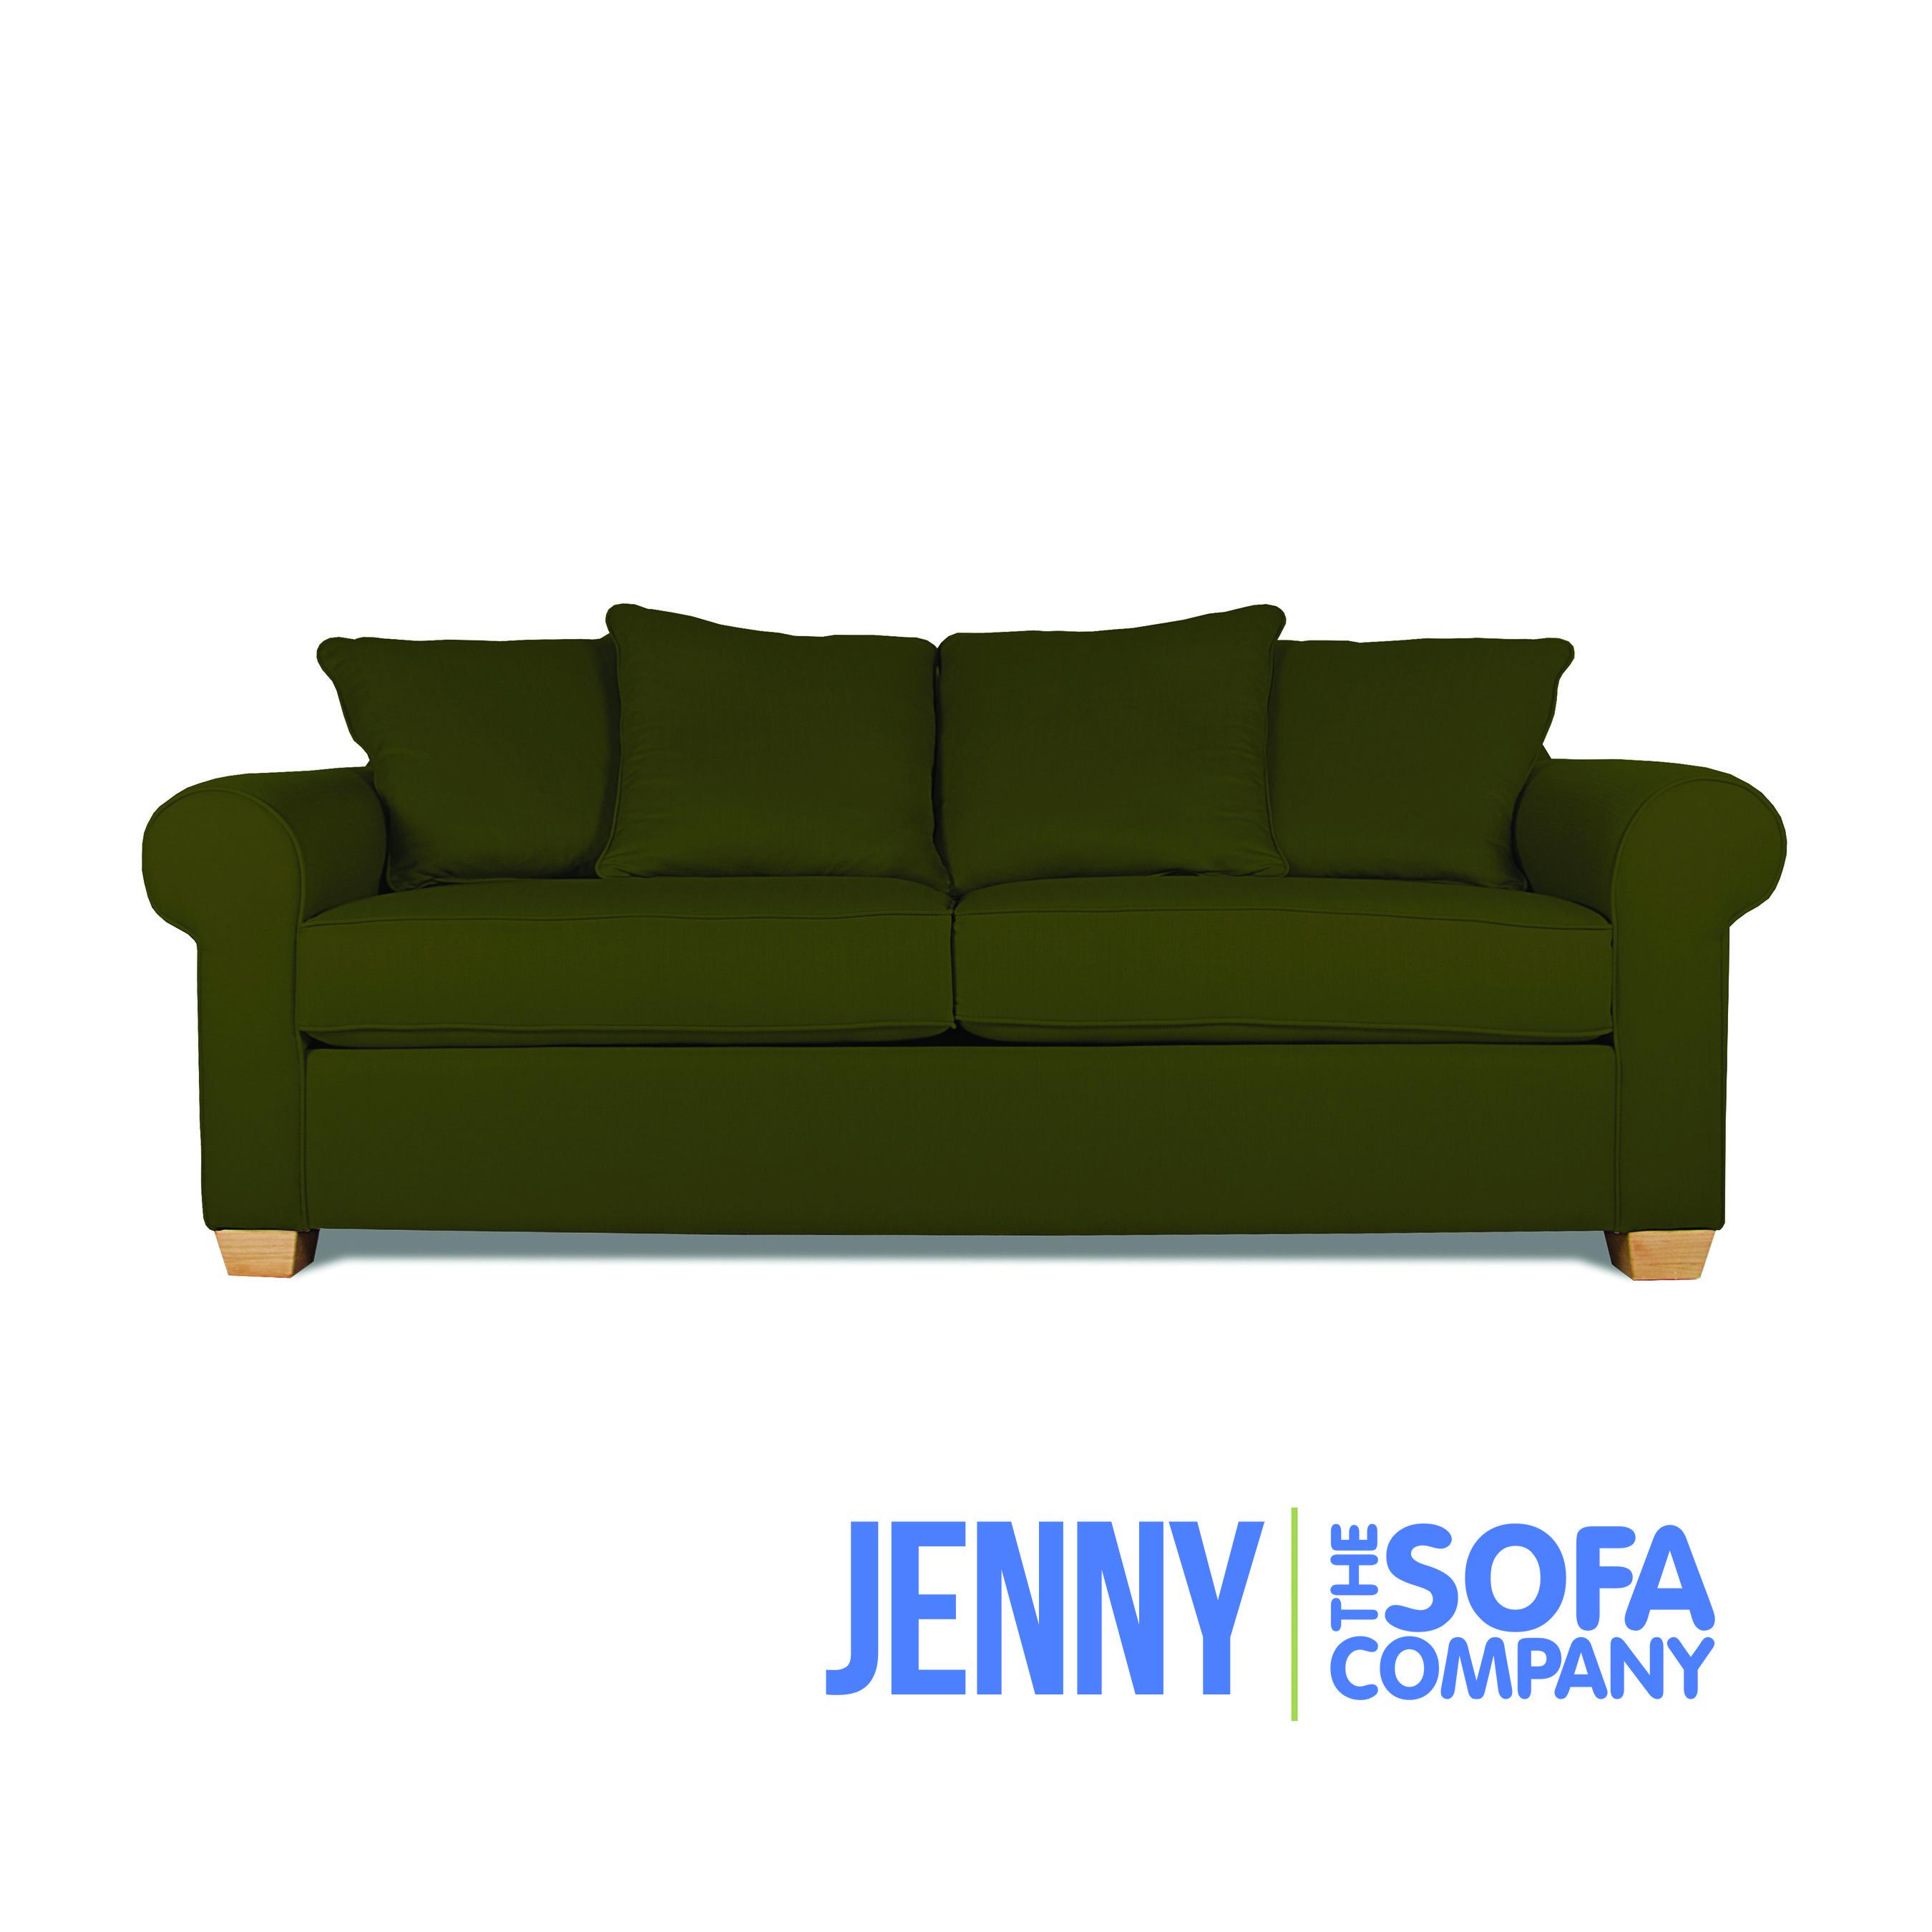 Jenny Sofa Style By The Sofa Company Www.thesofaco.com